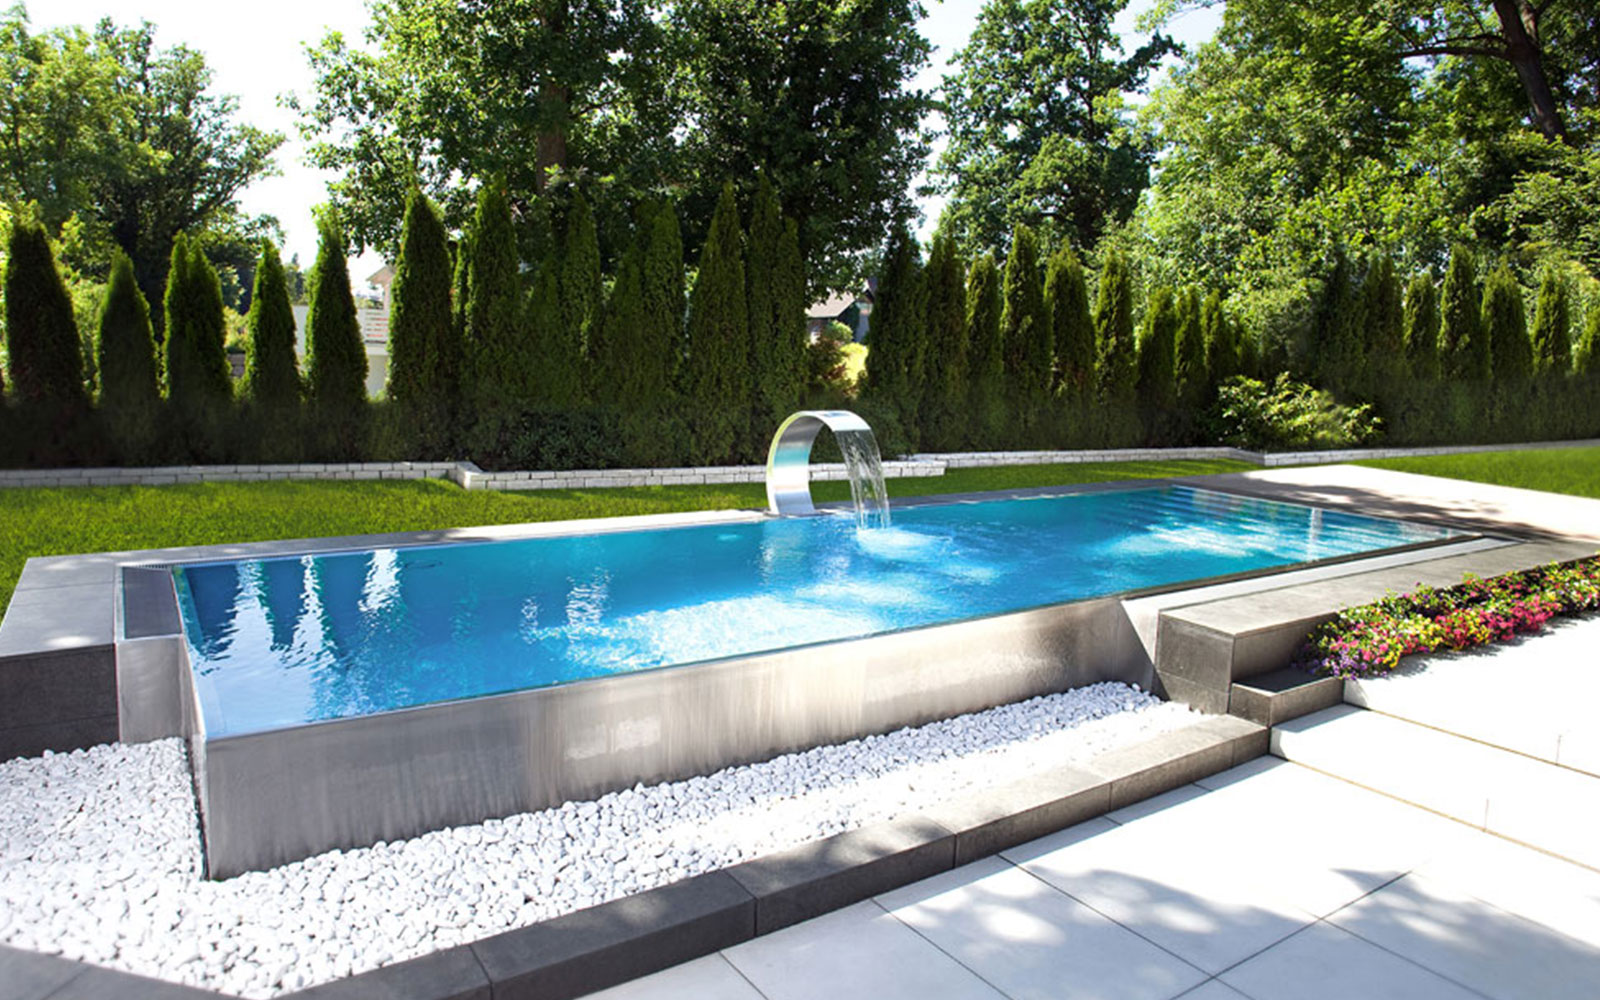 Neubau pools aus beton oder edelstahl schwimmbadservice for Pool edelstahl